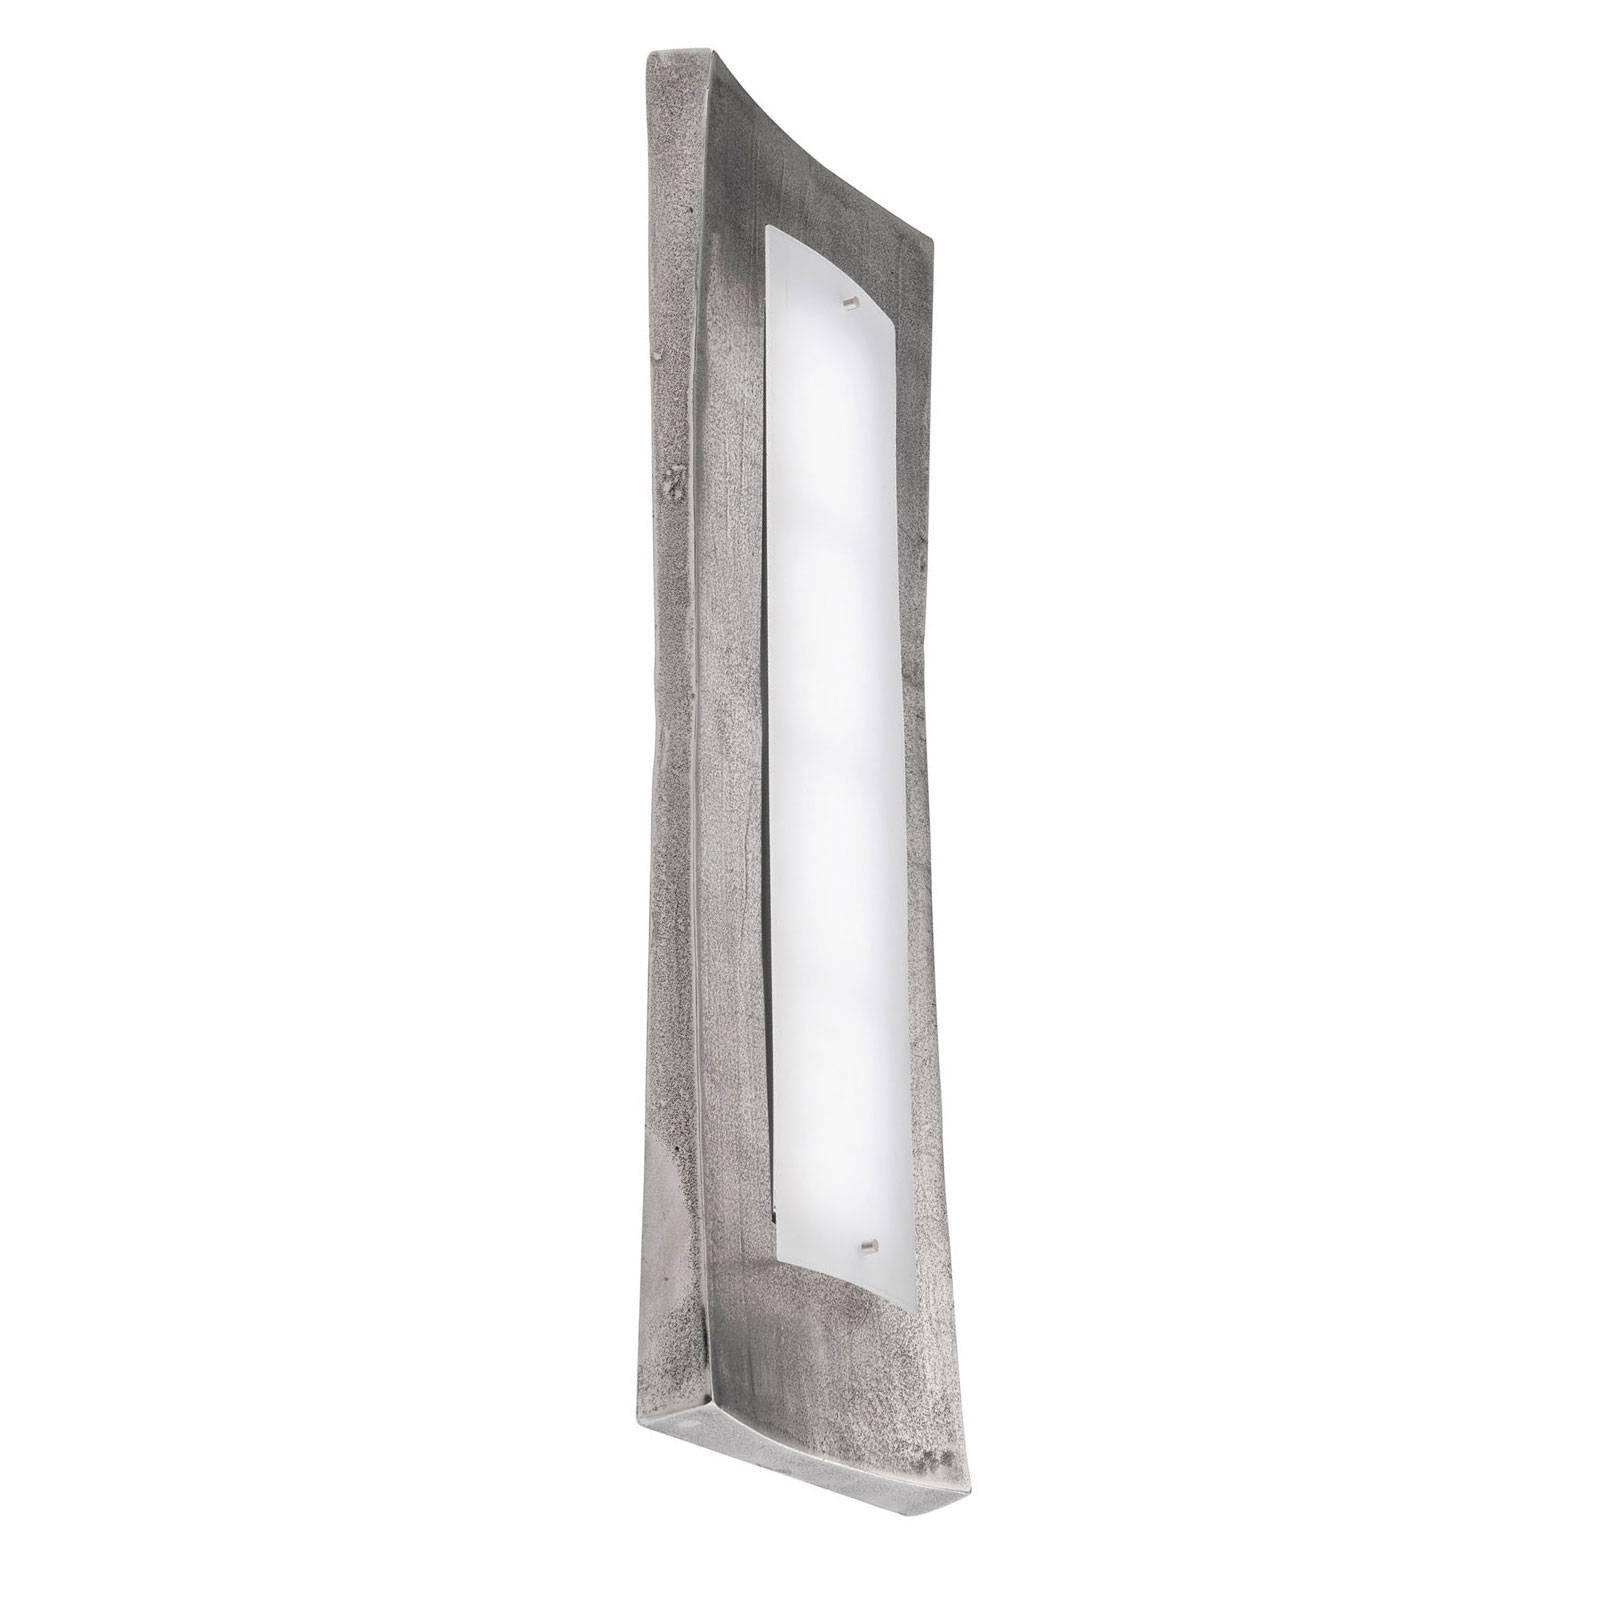 Vegglampe Calais CCT-fjernkontroll, lengde 90 cm